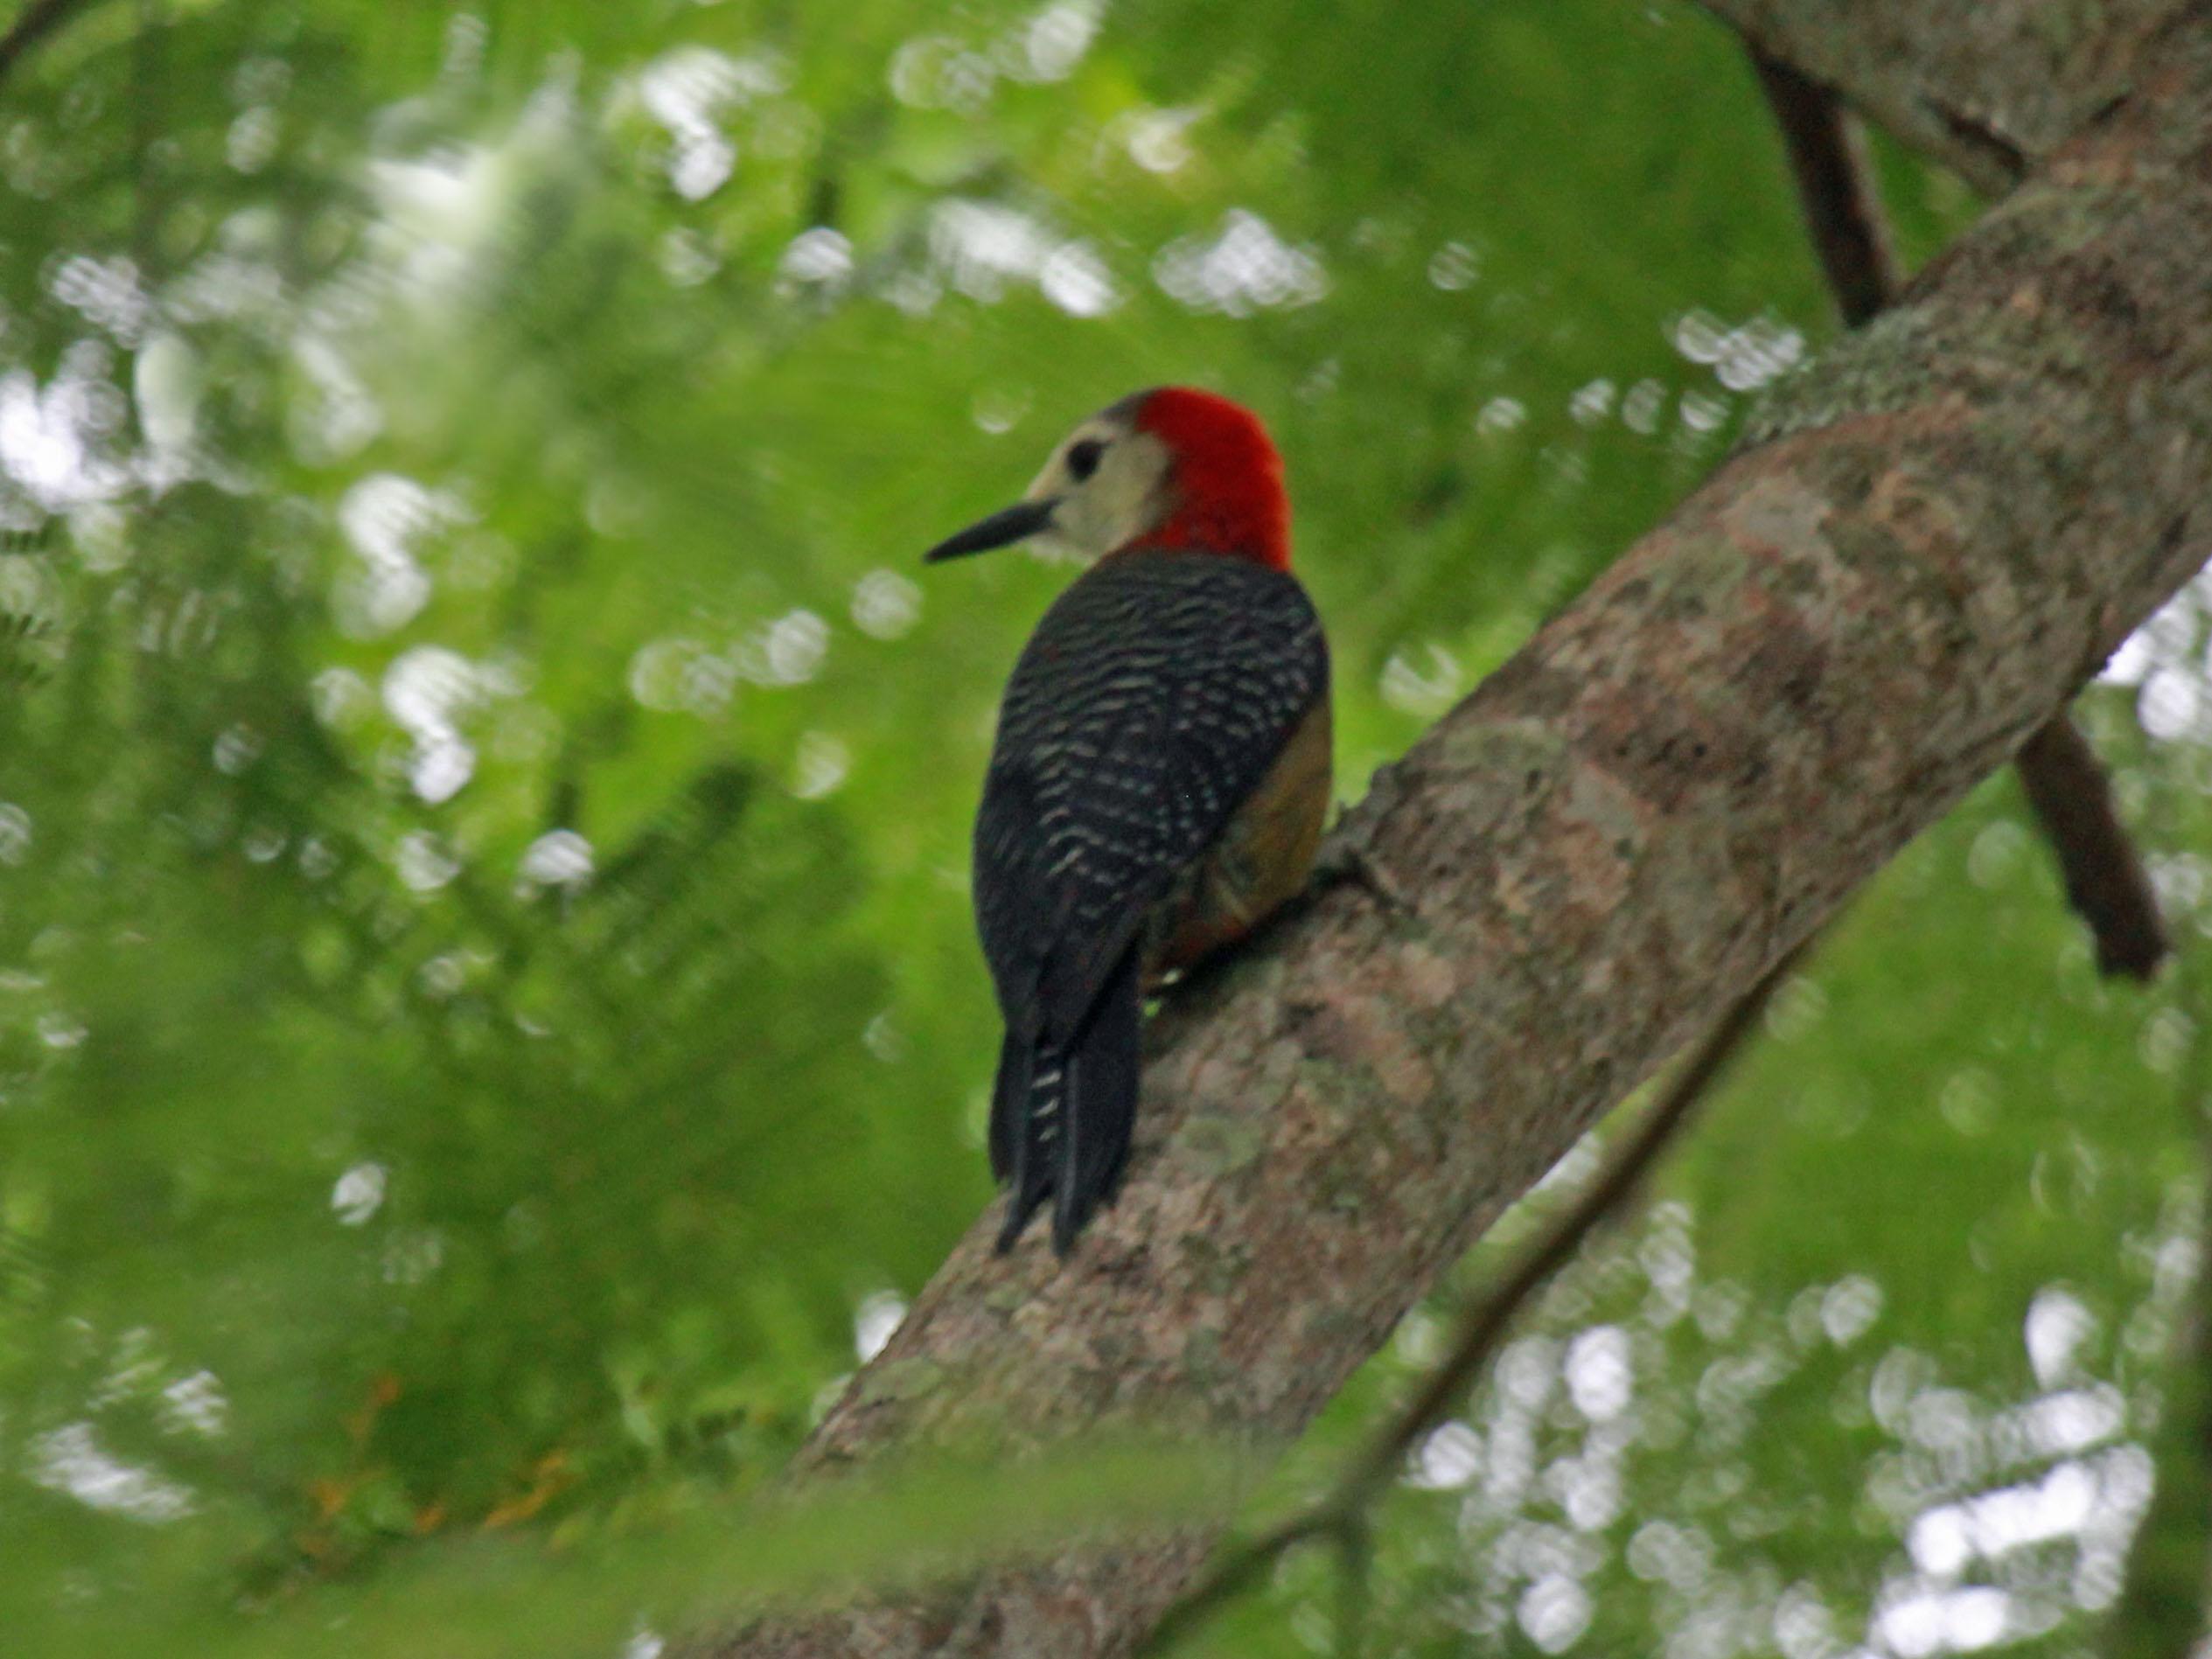 Jamaican Woodpecker RWD2.jpg © DickDaniels (http://carolinabirds.org/)